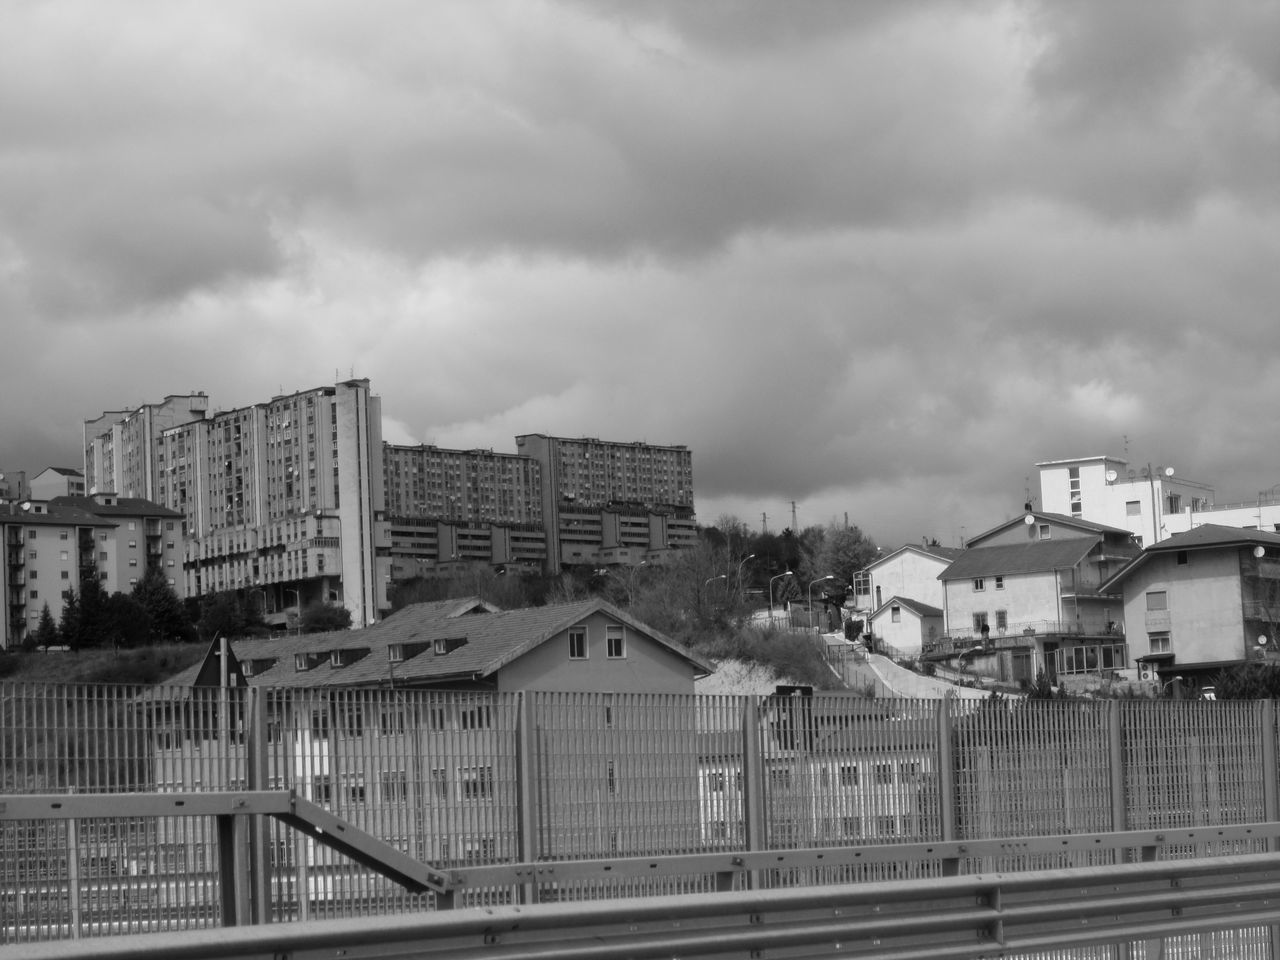 #basilicata #Black&White #blackandwhite #fotobiancoenero #fotobianconero #gallitello #lucania #potenza #potenzainferiore #urbanphotography